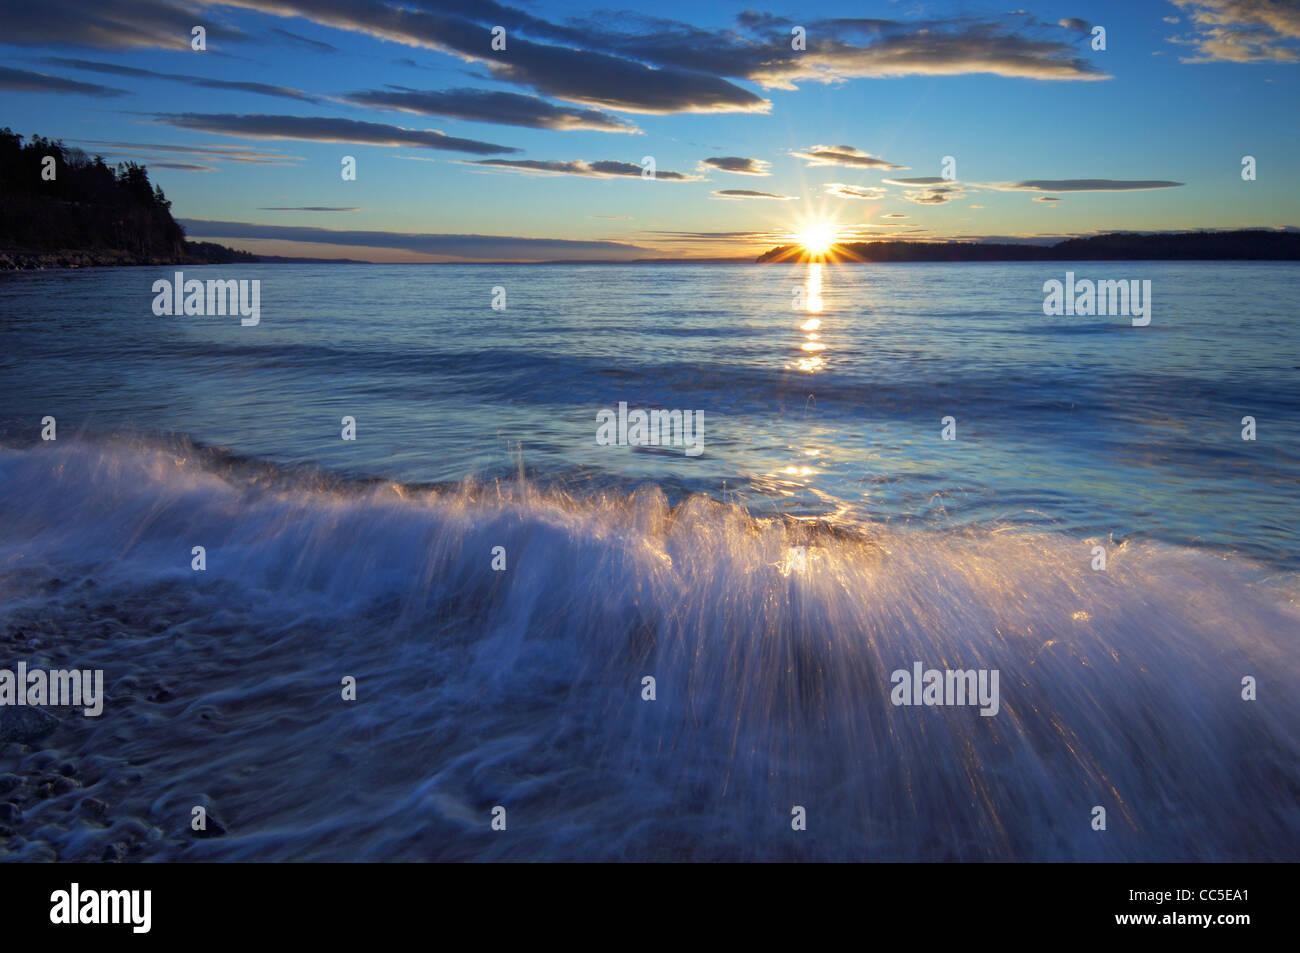 Sunset over Puget Sound at Mukilteo, Washington, USA - Stock Image